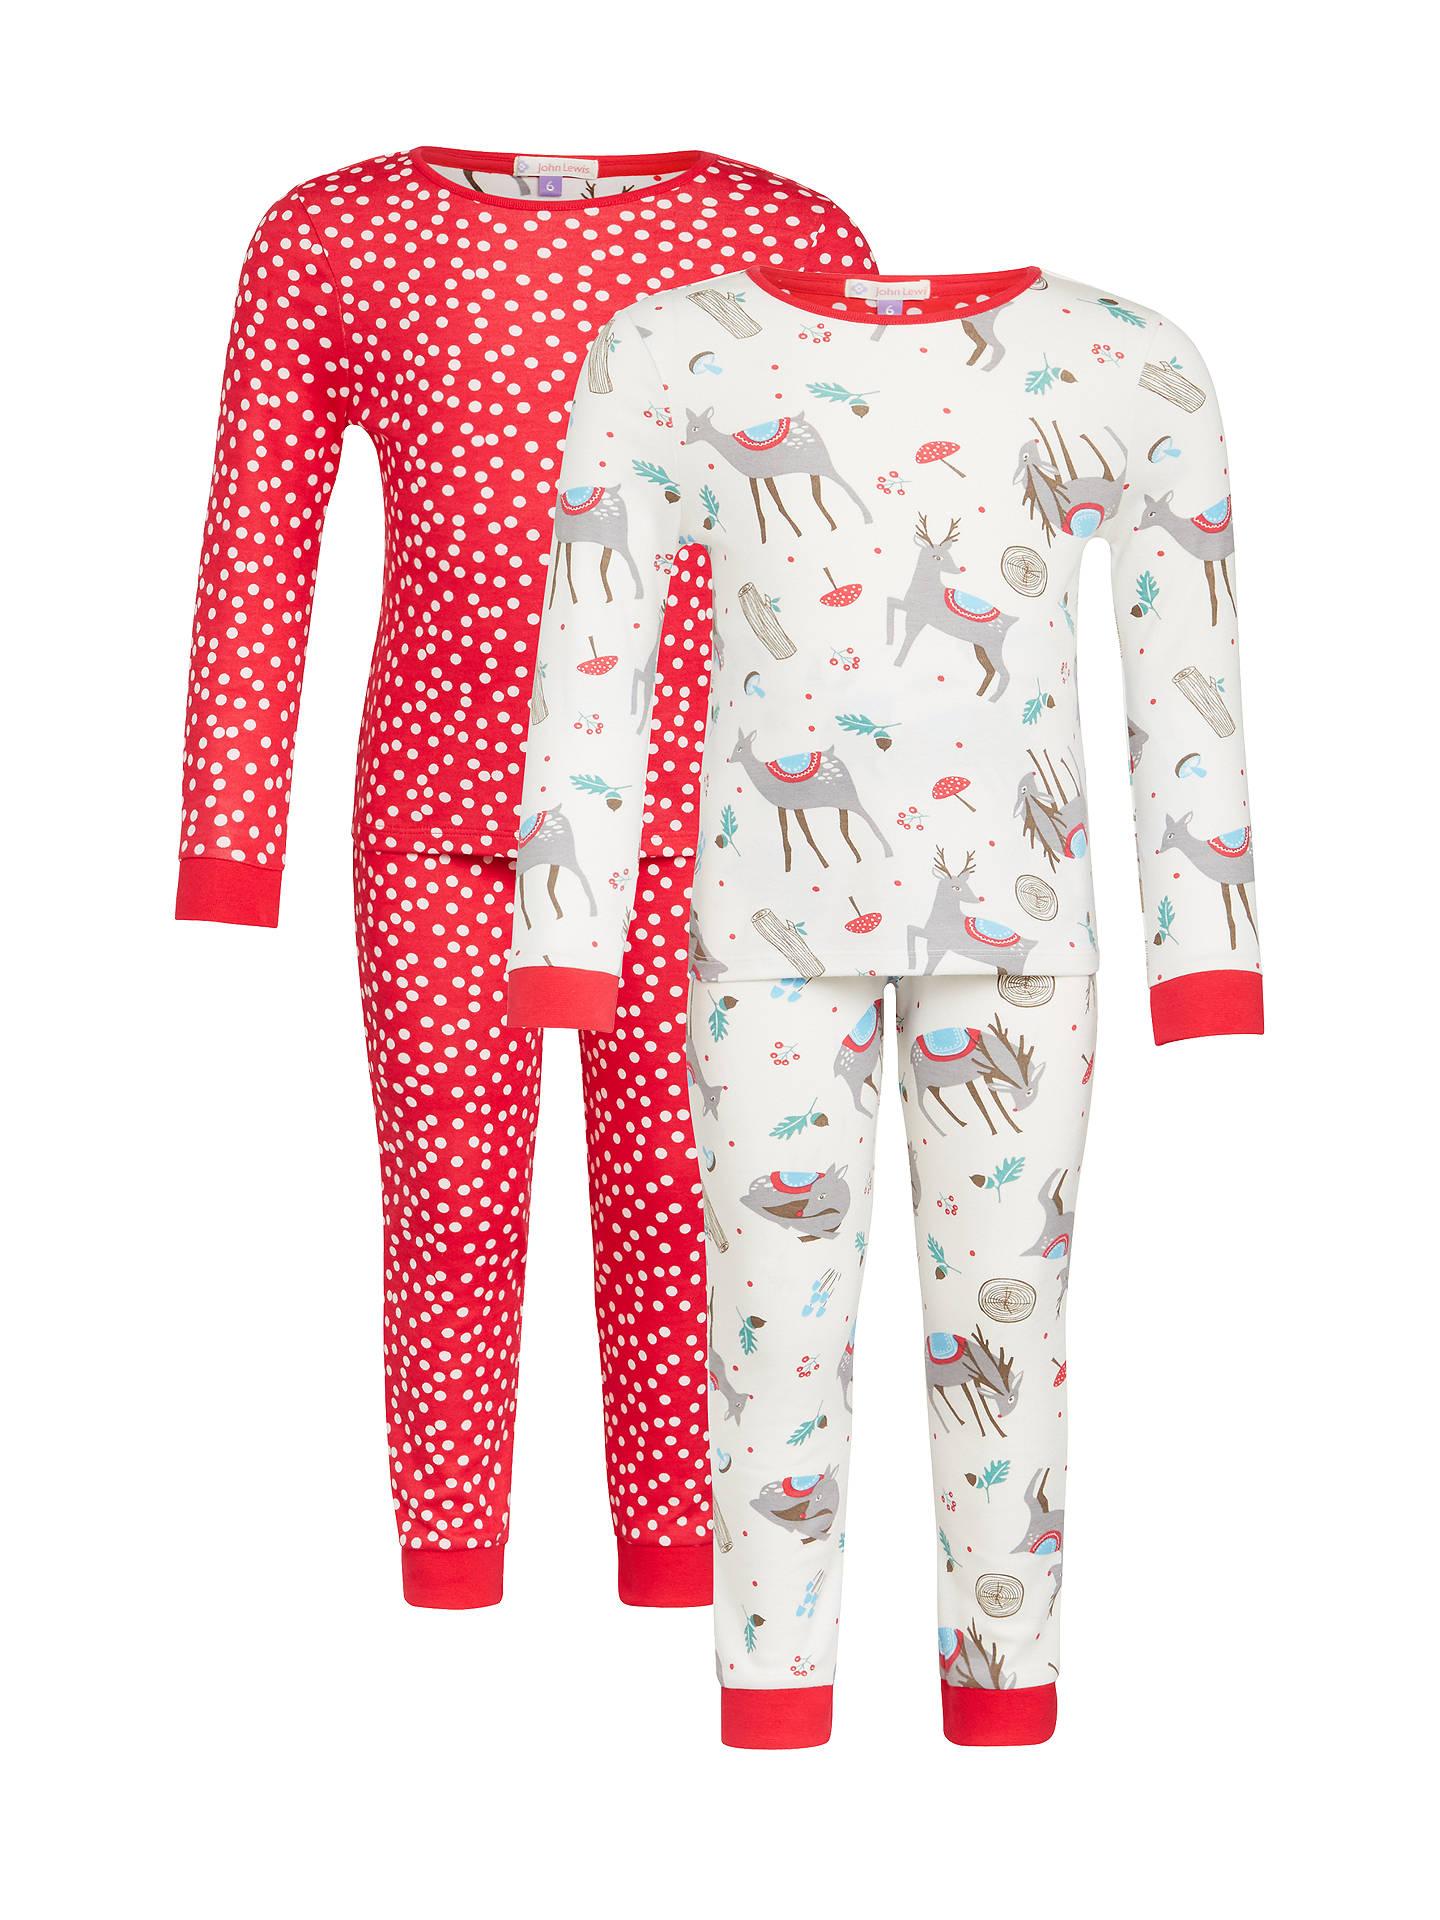 BuyJohn Lewis Girls  Christmas Reindeer Pyjama Set a0a641c50